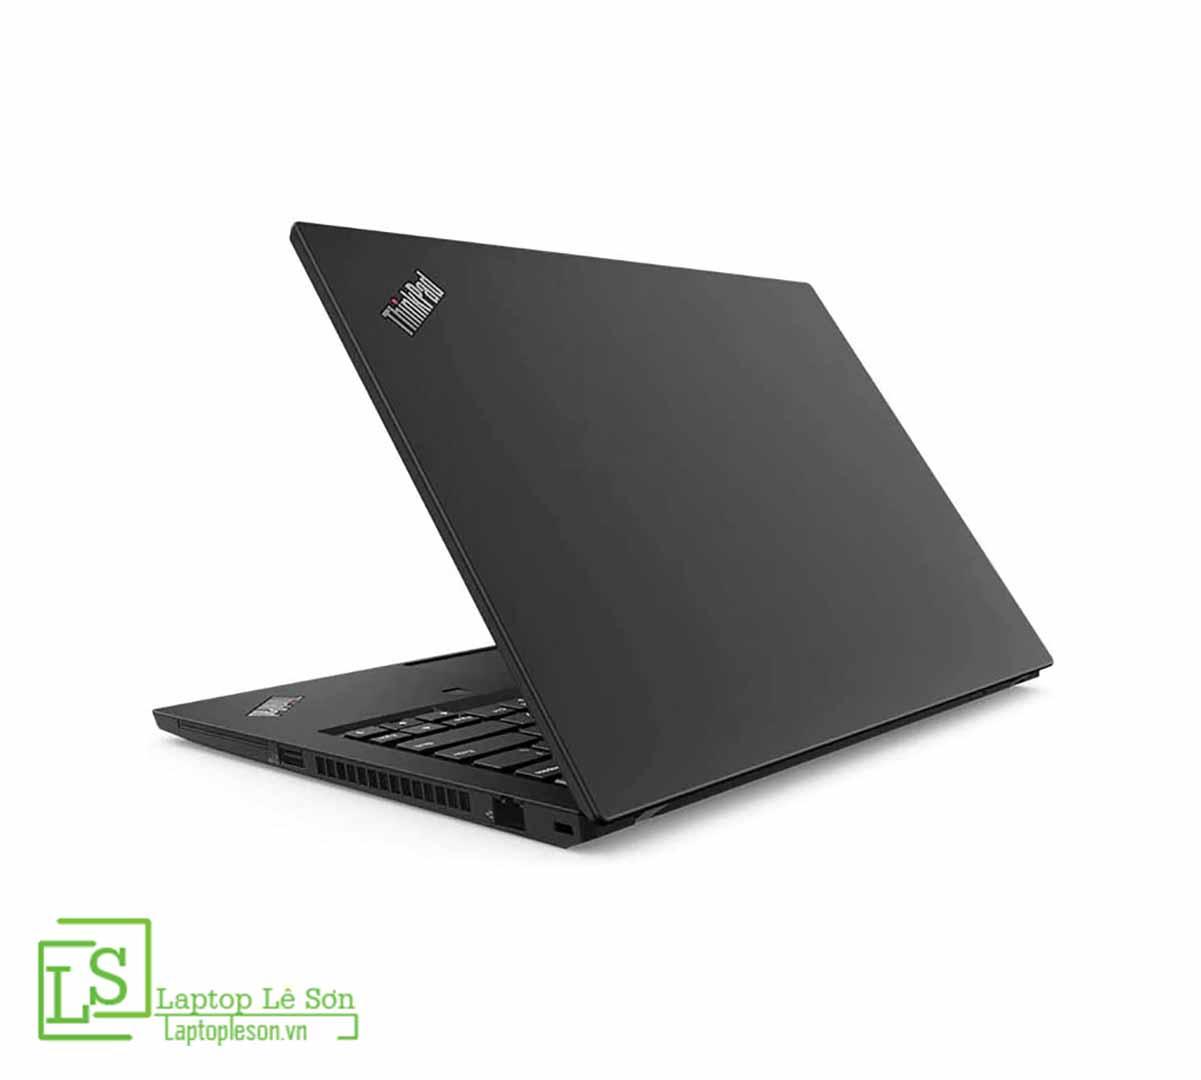 Lenovo ThinkPad T490 - Laptop Lê Sơn 02